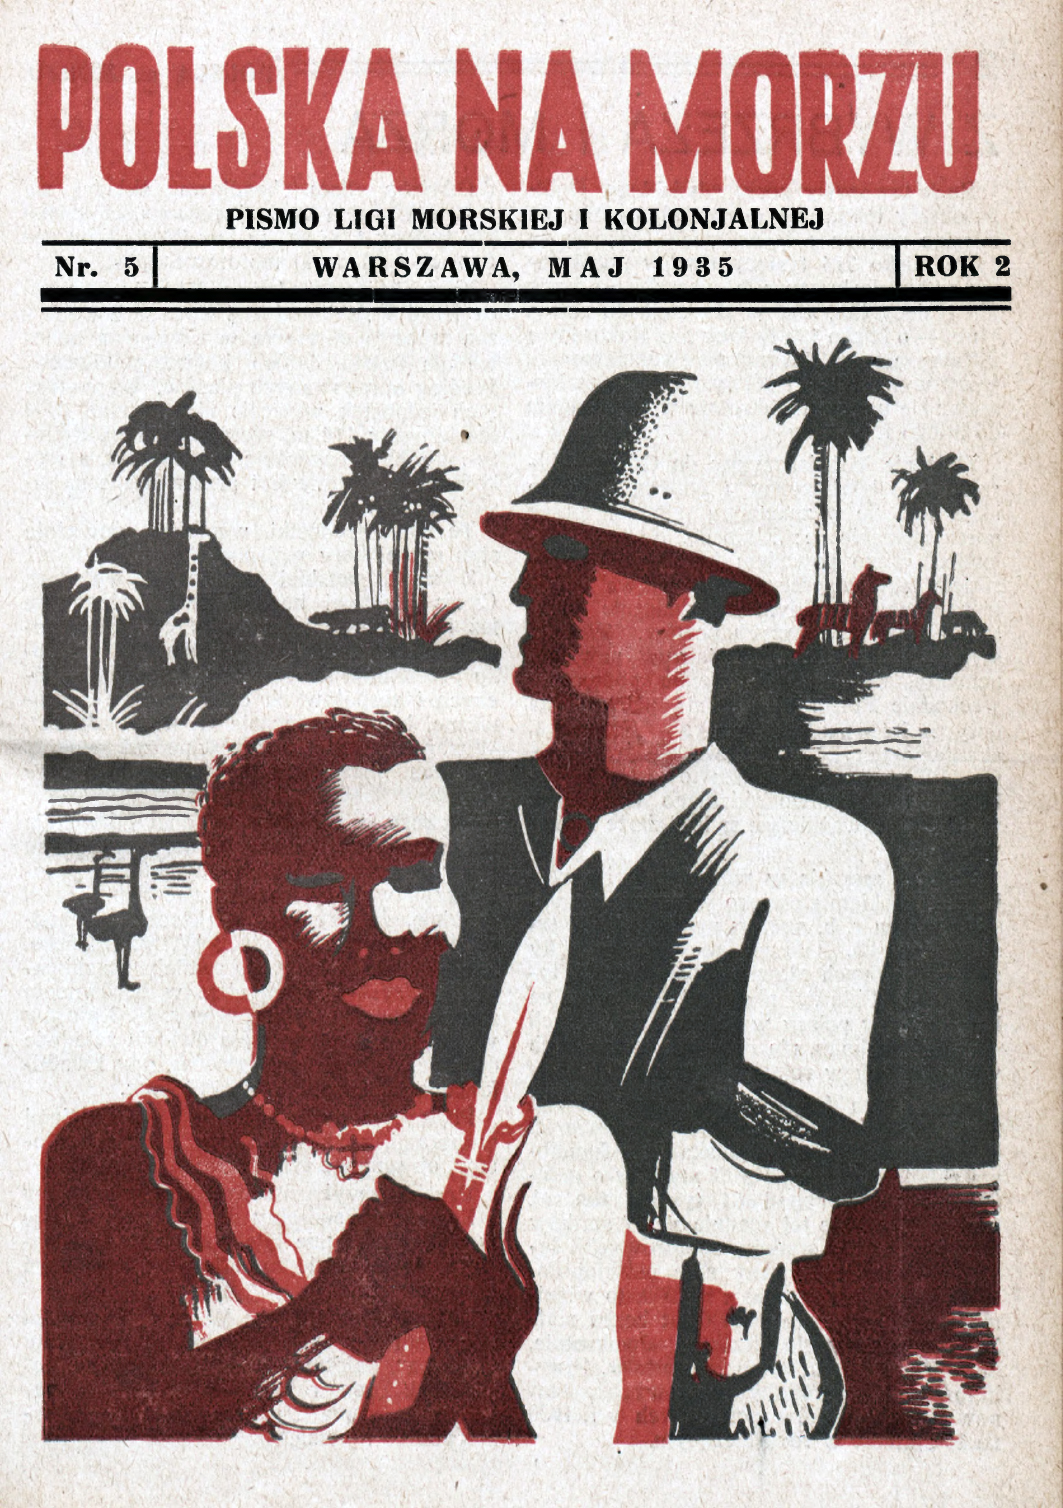 Polska na Morzu : pismo Ligi Morskiej i Kolonjalnej. - Liga Morska i Kolonialna, 1935, nr 5